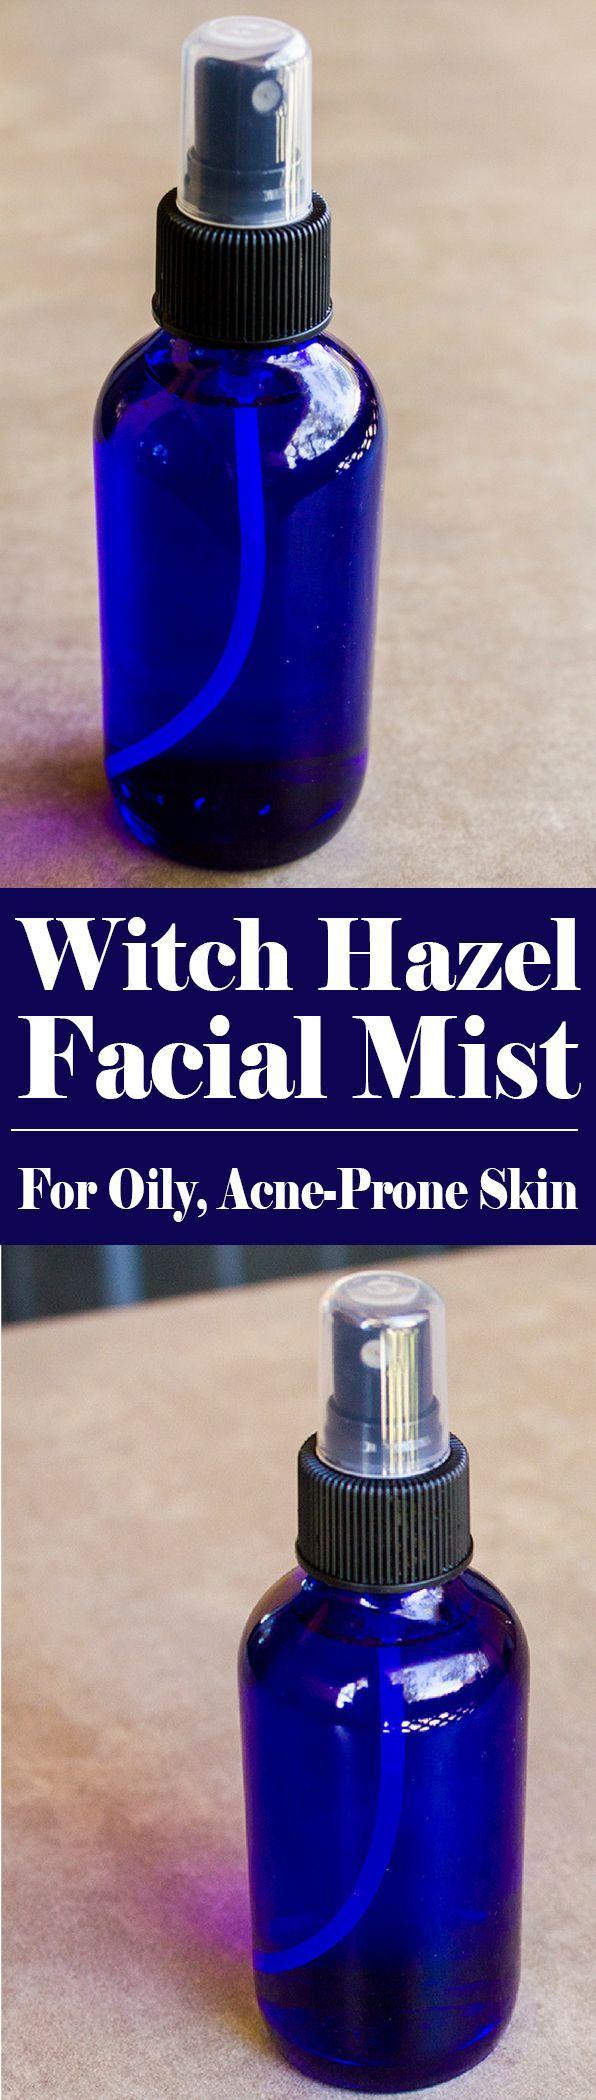 Witch Hazel for Acne-Prone Skin   Witch Hazel Facial Mist   http://homemadeforelle.com